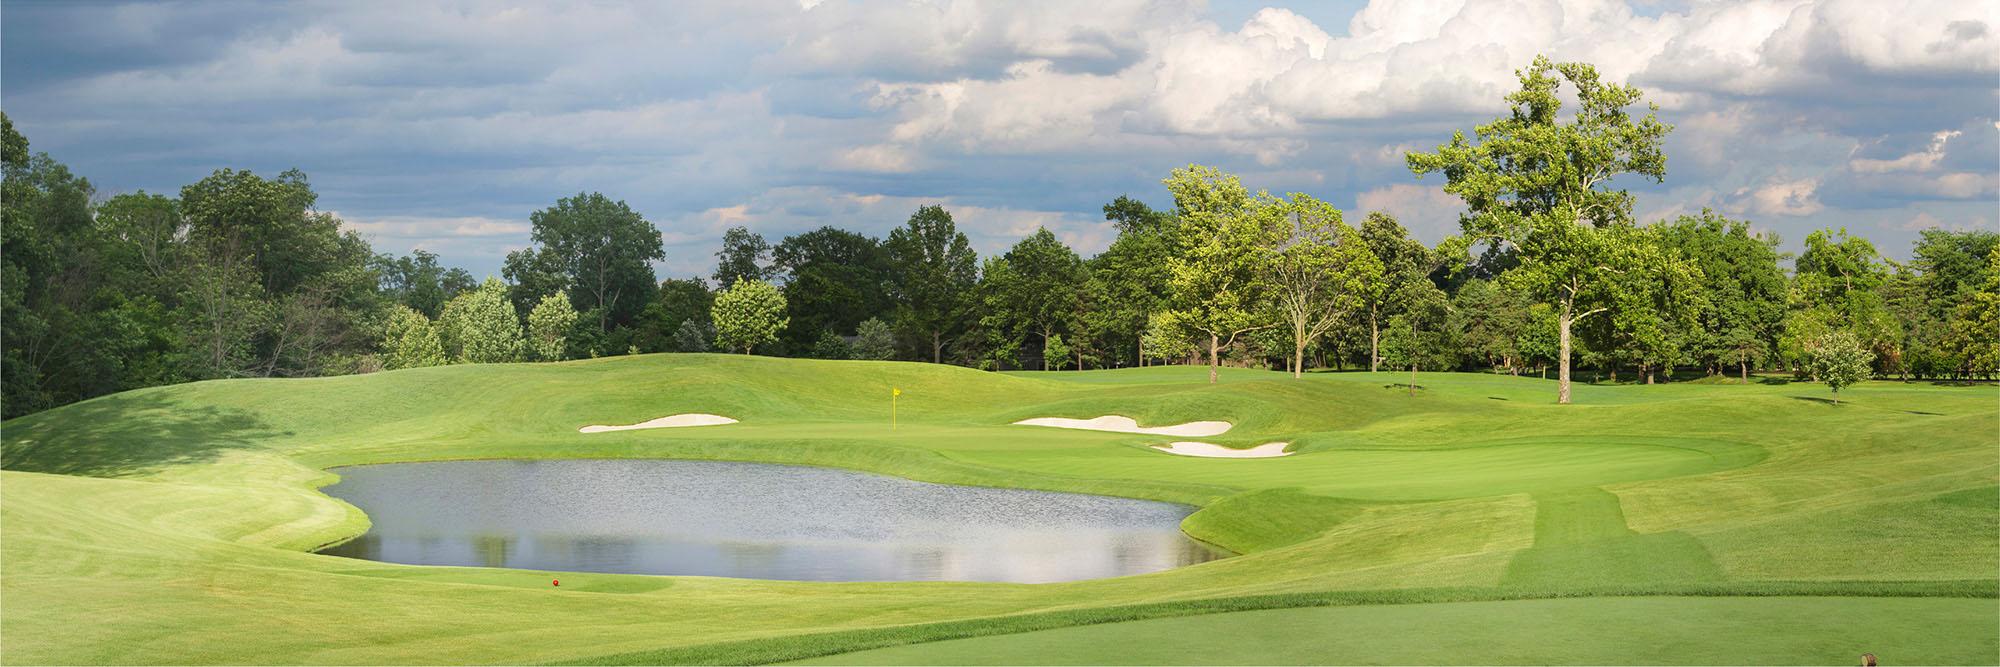 Golf Course Image - Muirfield Village No. 16